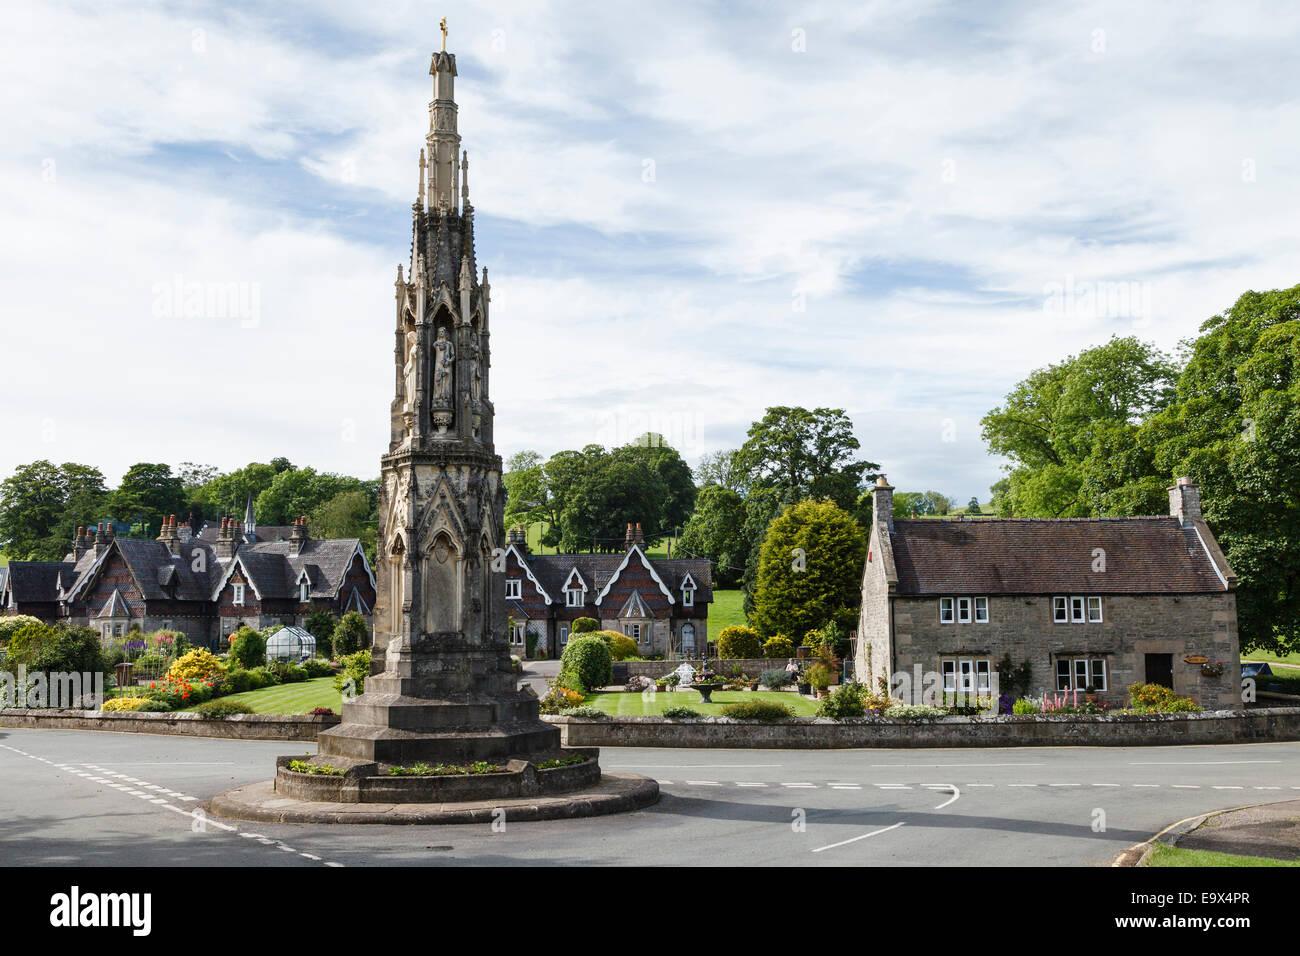 Ilam Cross, Peak District National Park, Staffordshire - Stock Image